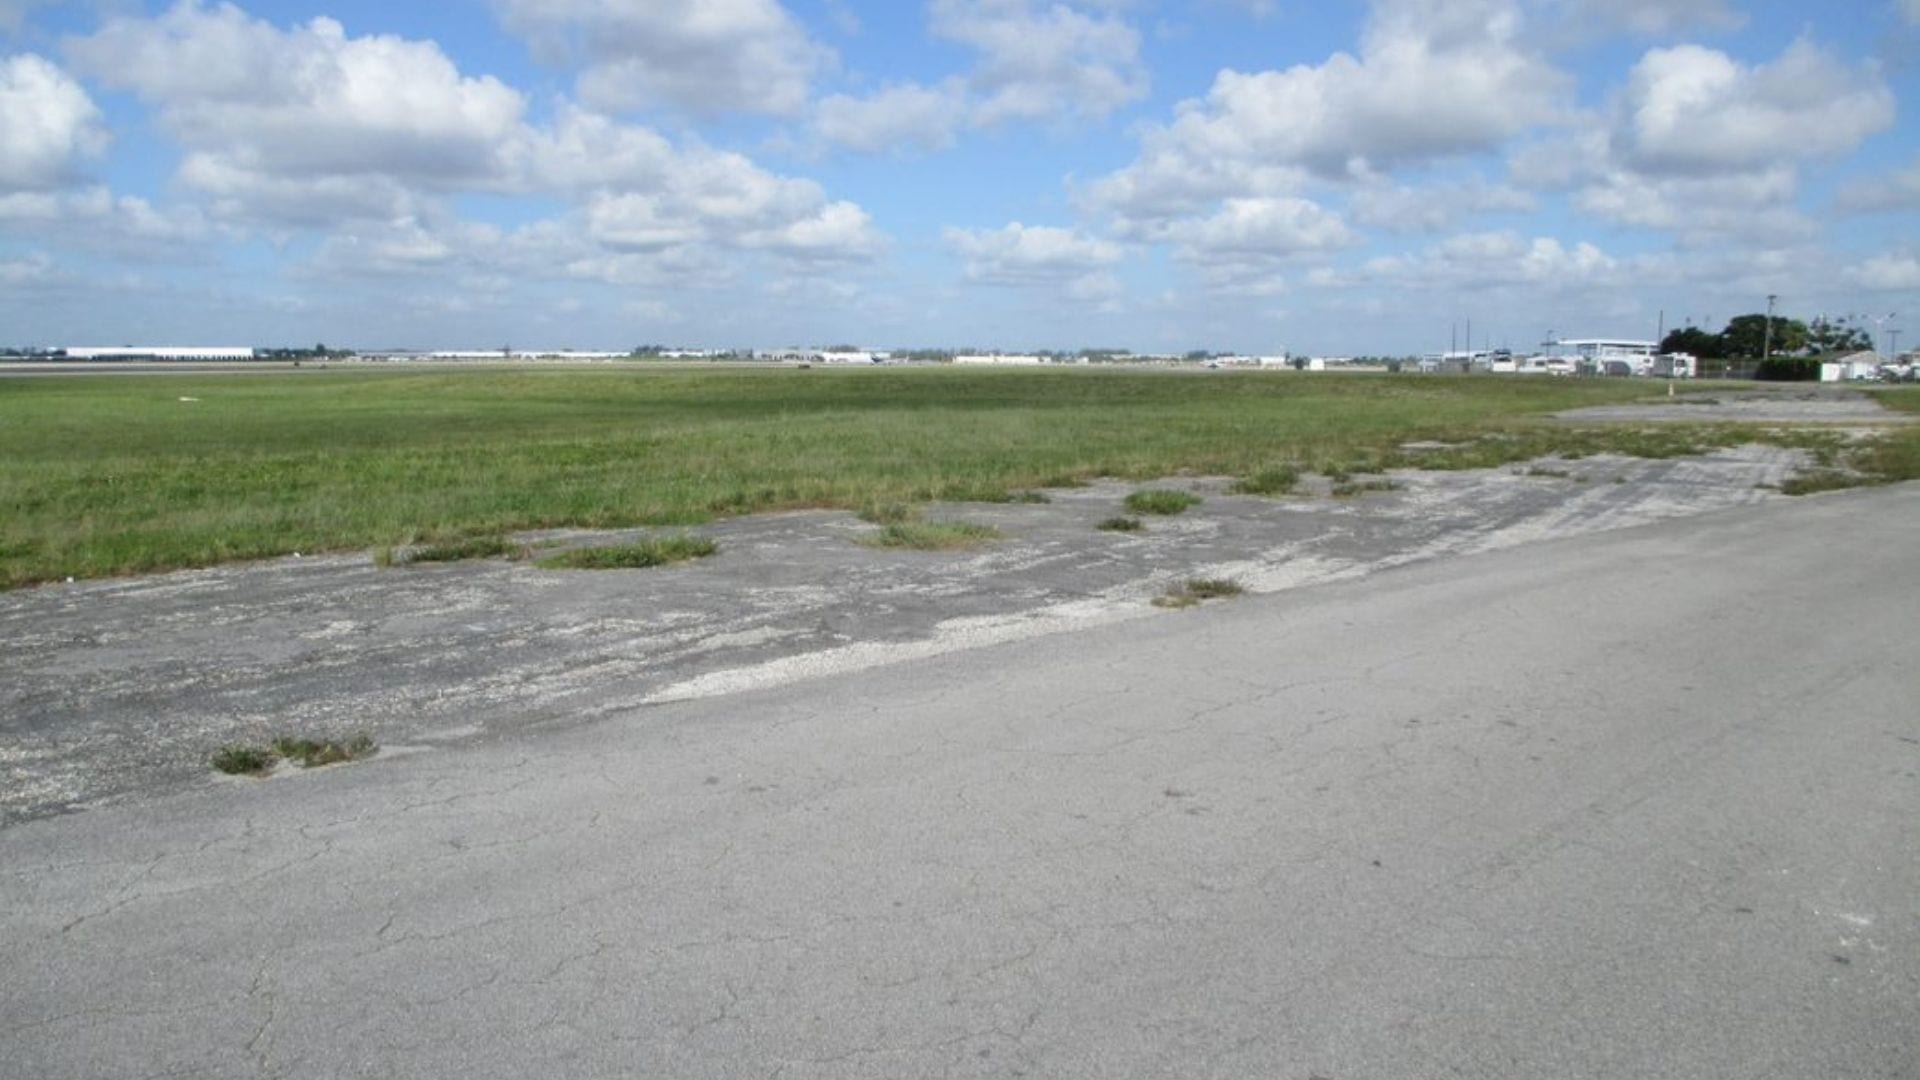 American Environmental Aviation